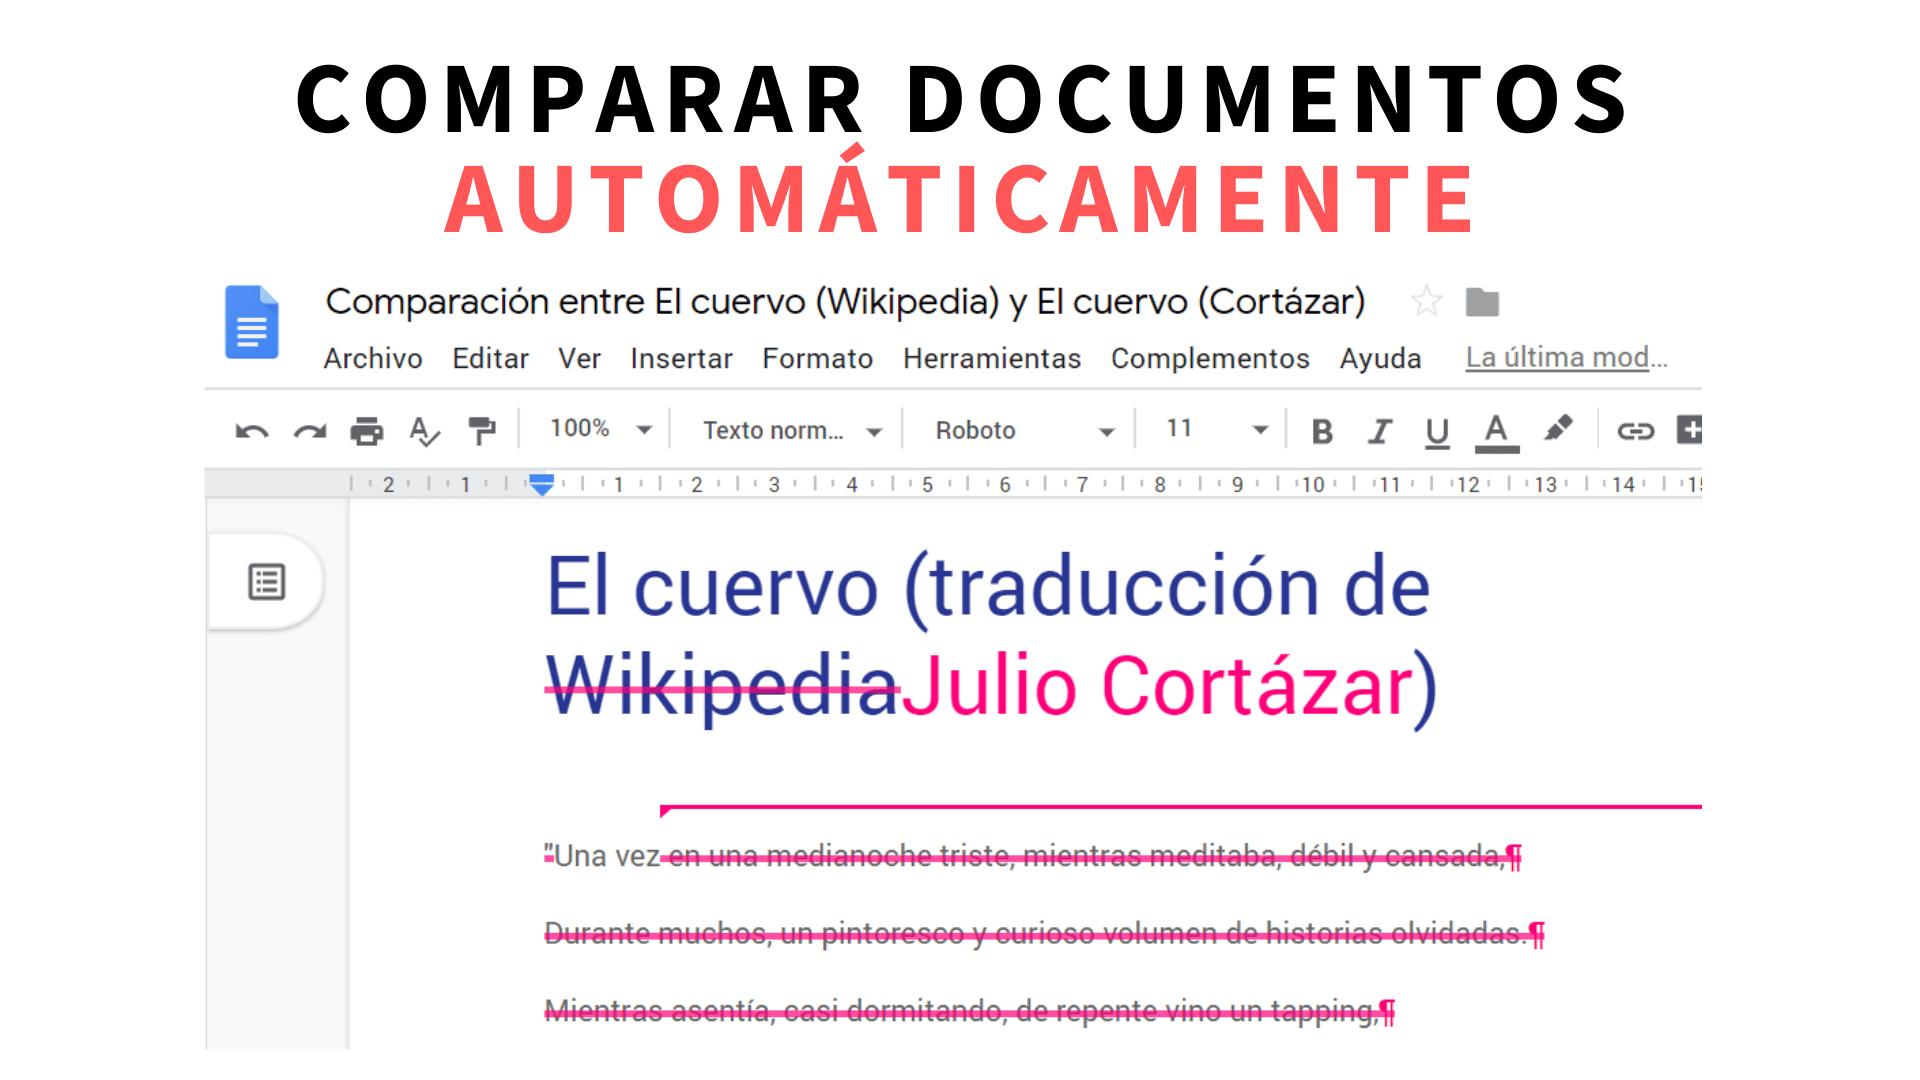 Comparar el texto de dos documentos automáticamente